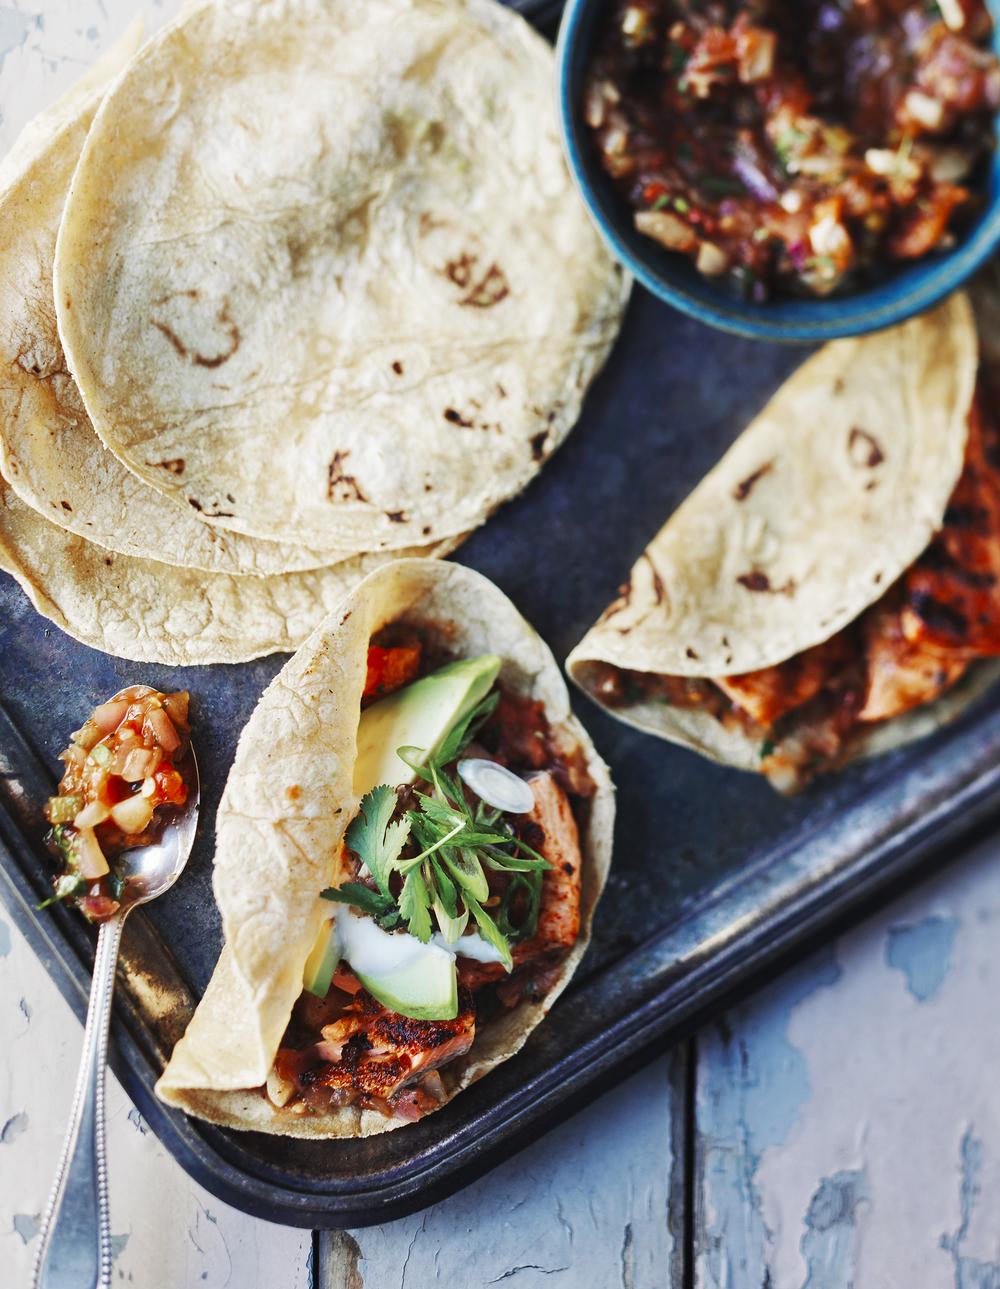 tacos diy mexican eats food photographer